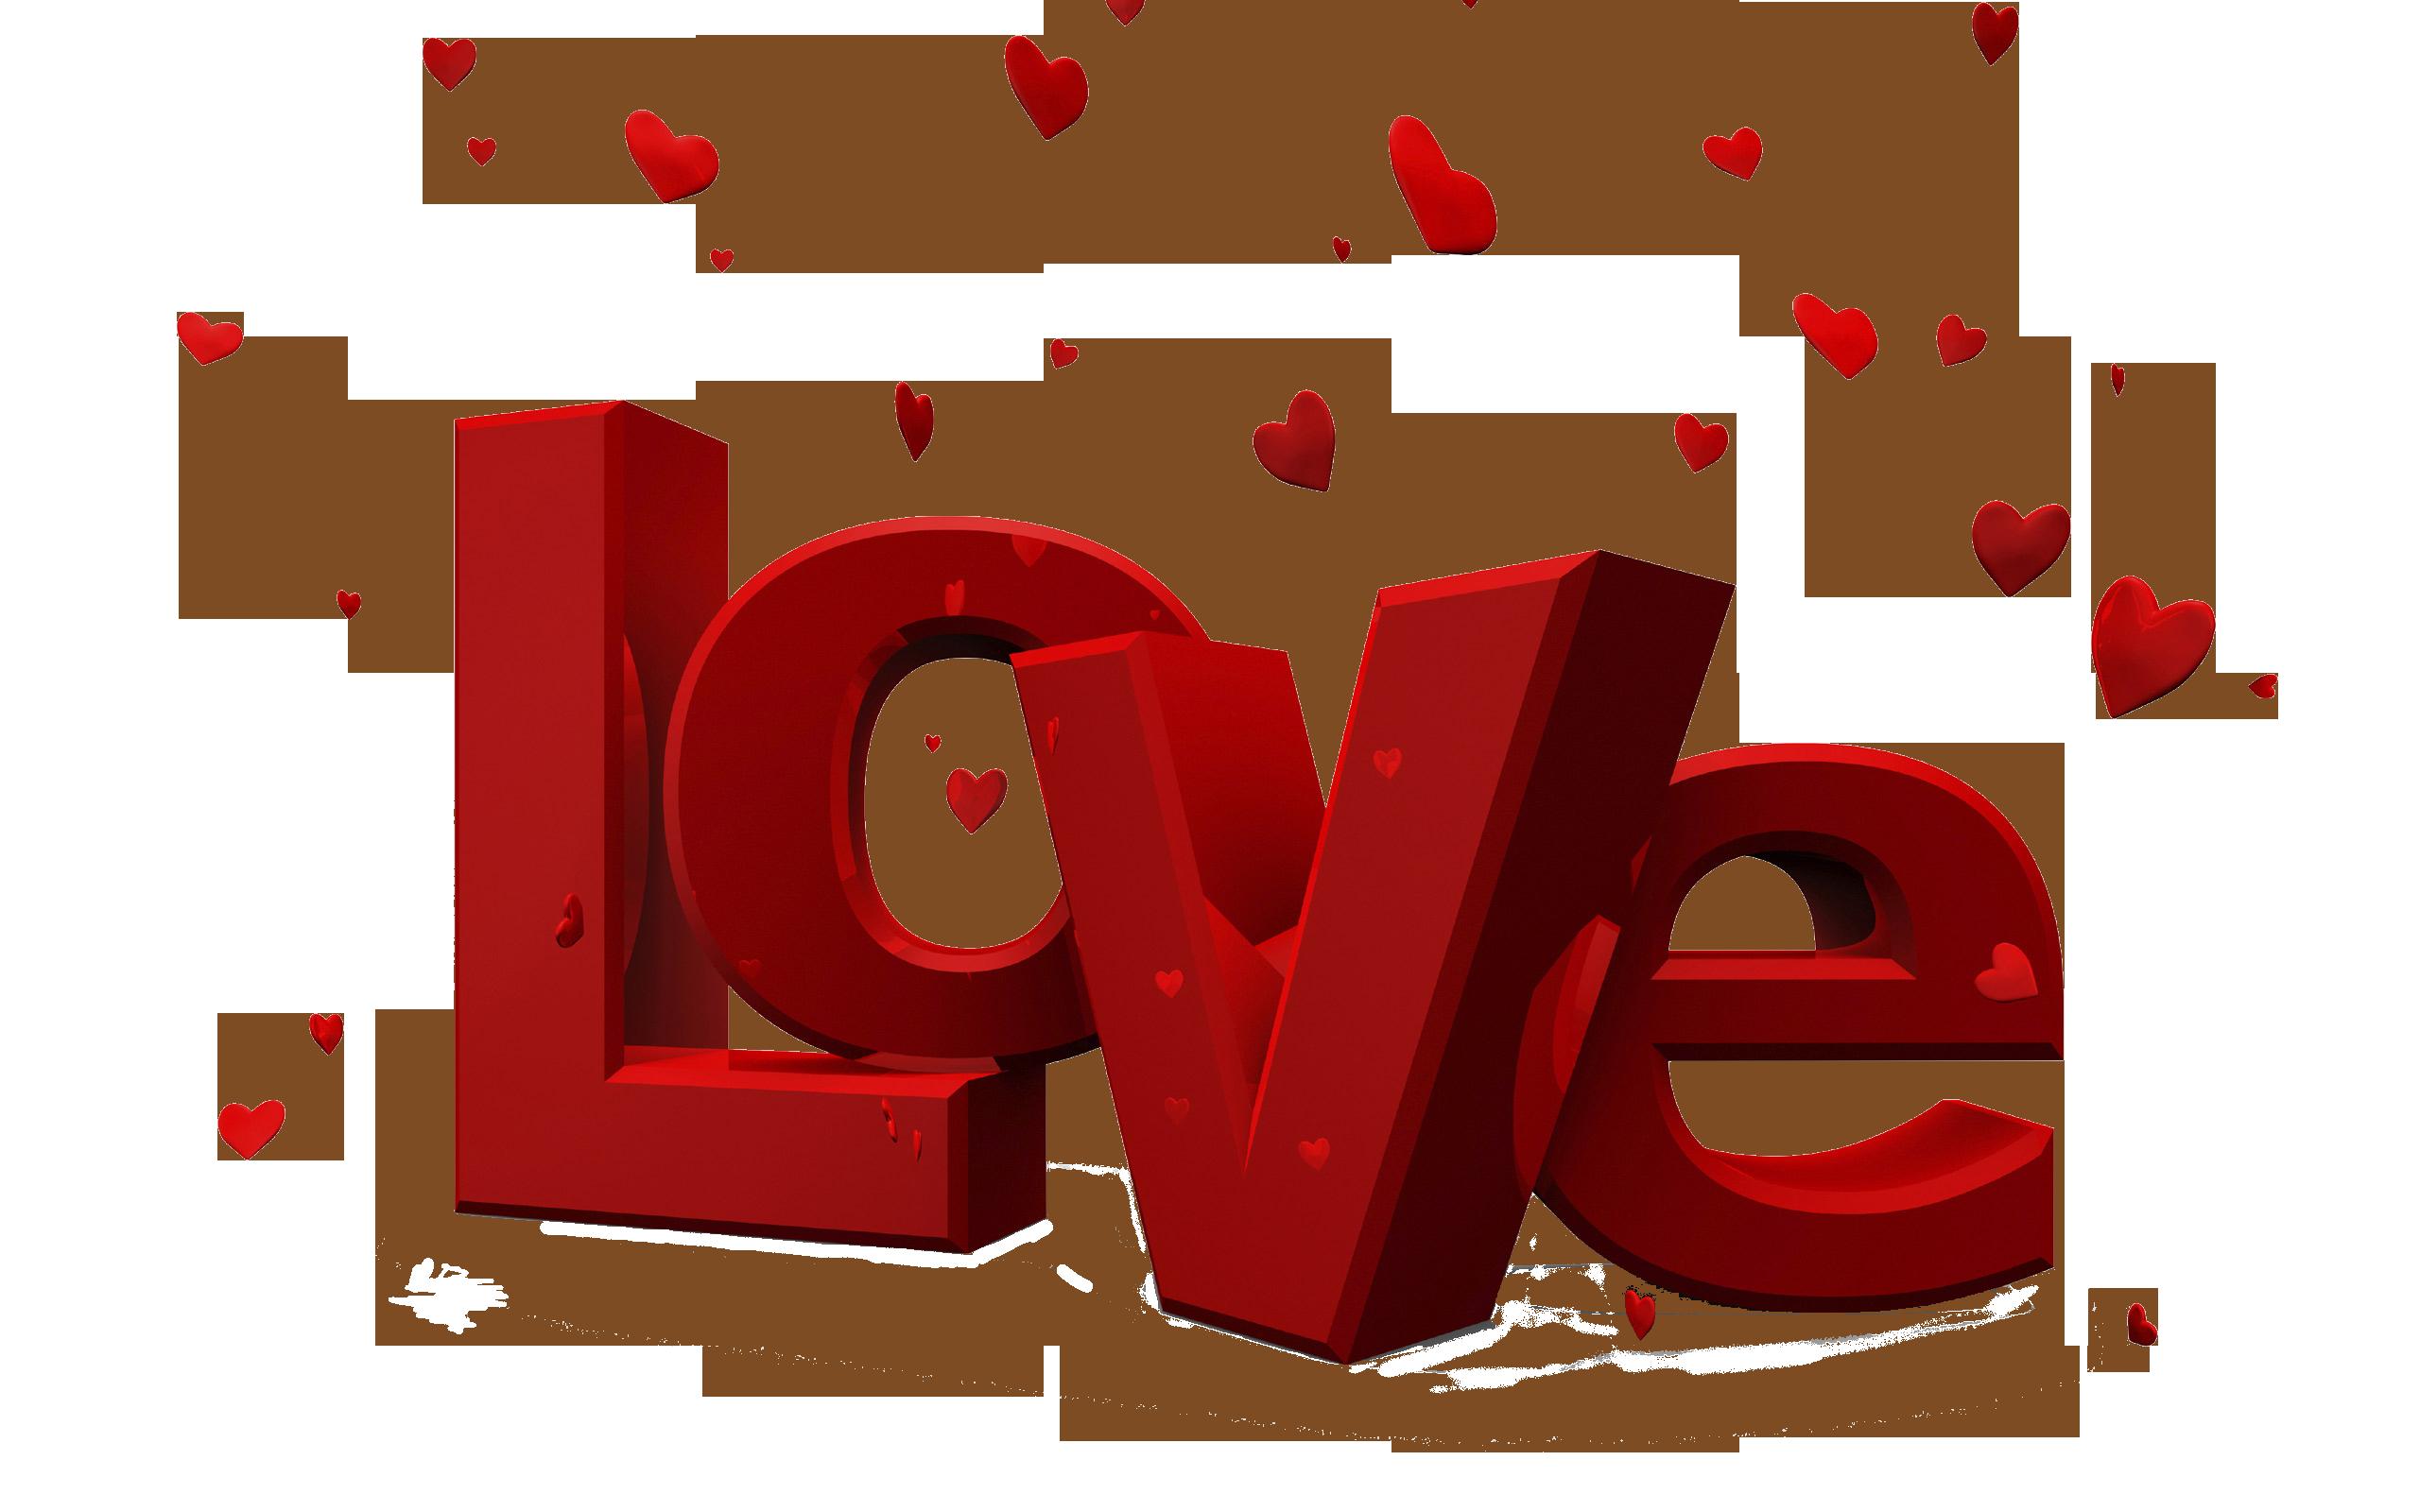 Love PNG Transparent Images.